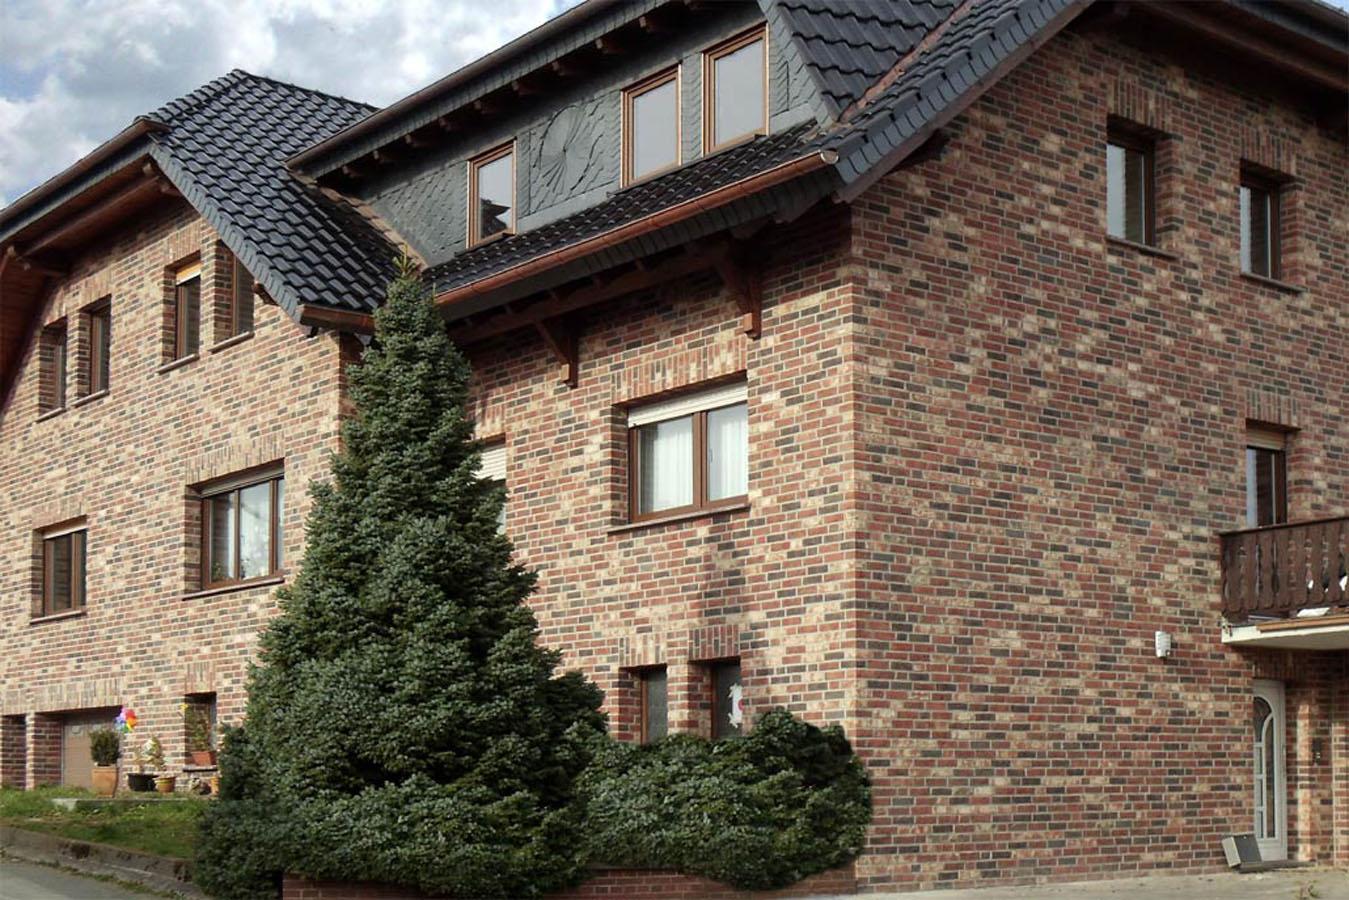 виды облицовочного кирпича для фасада